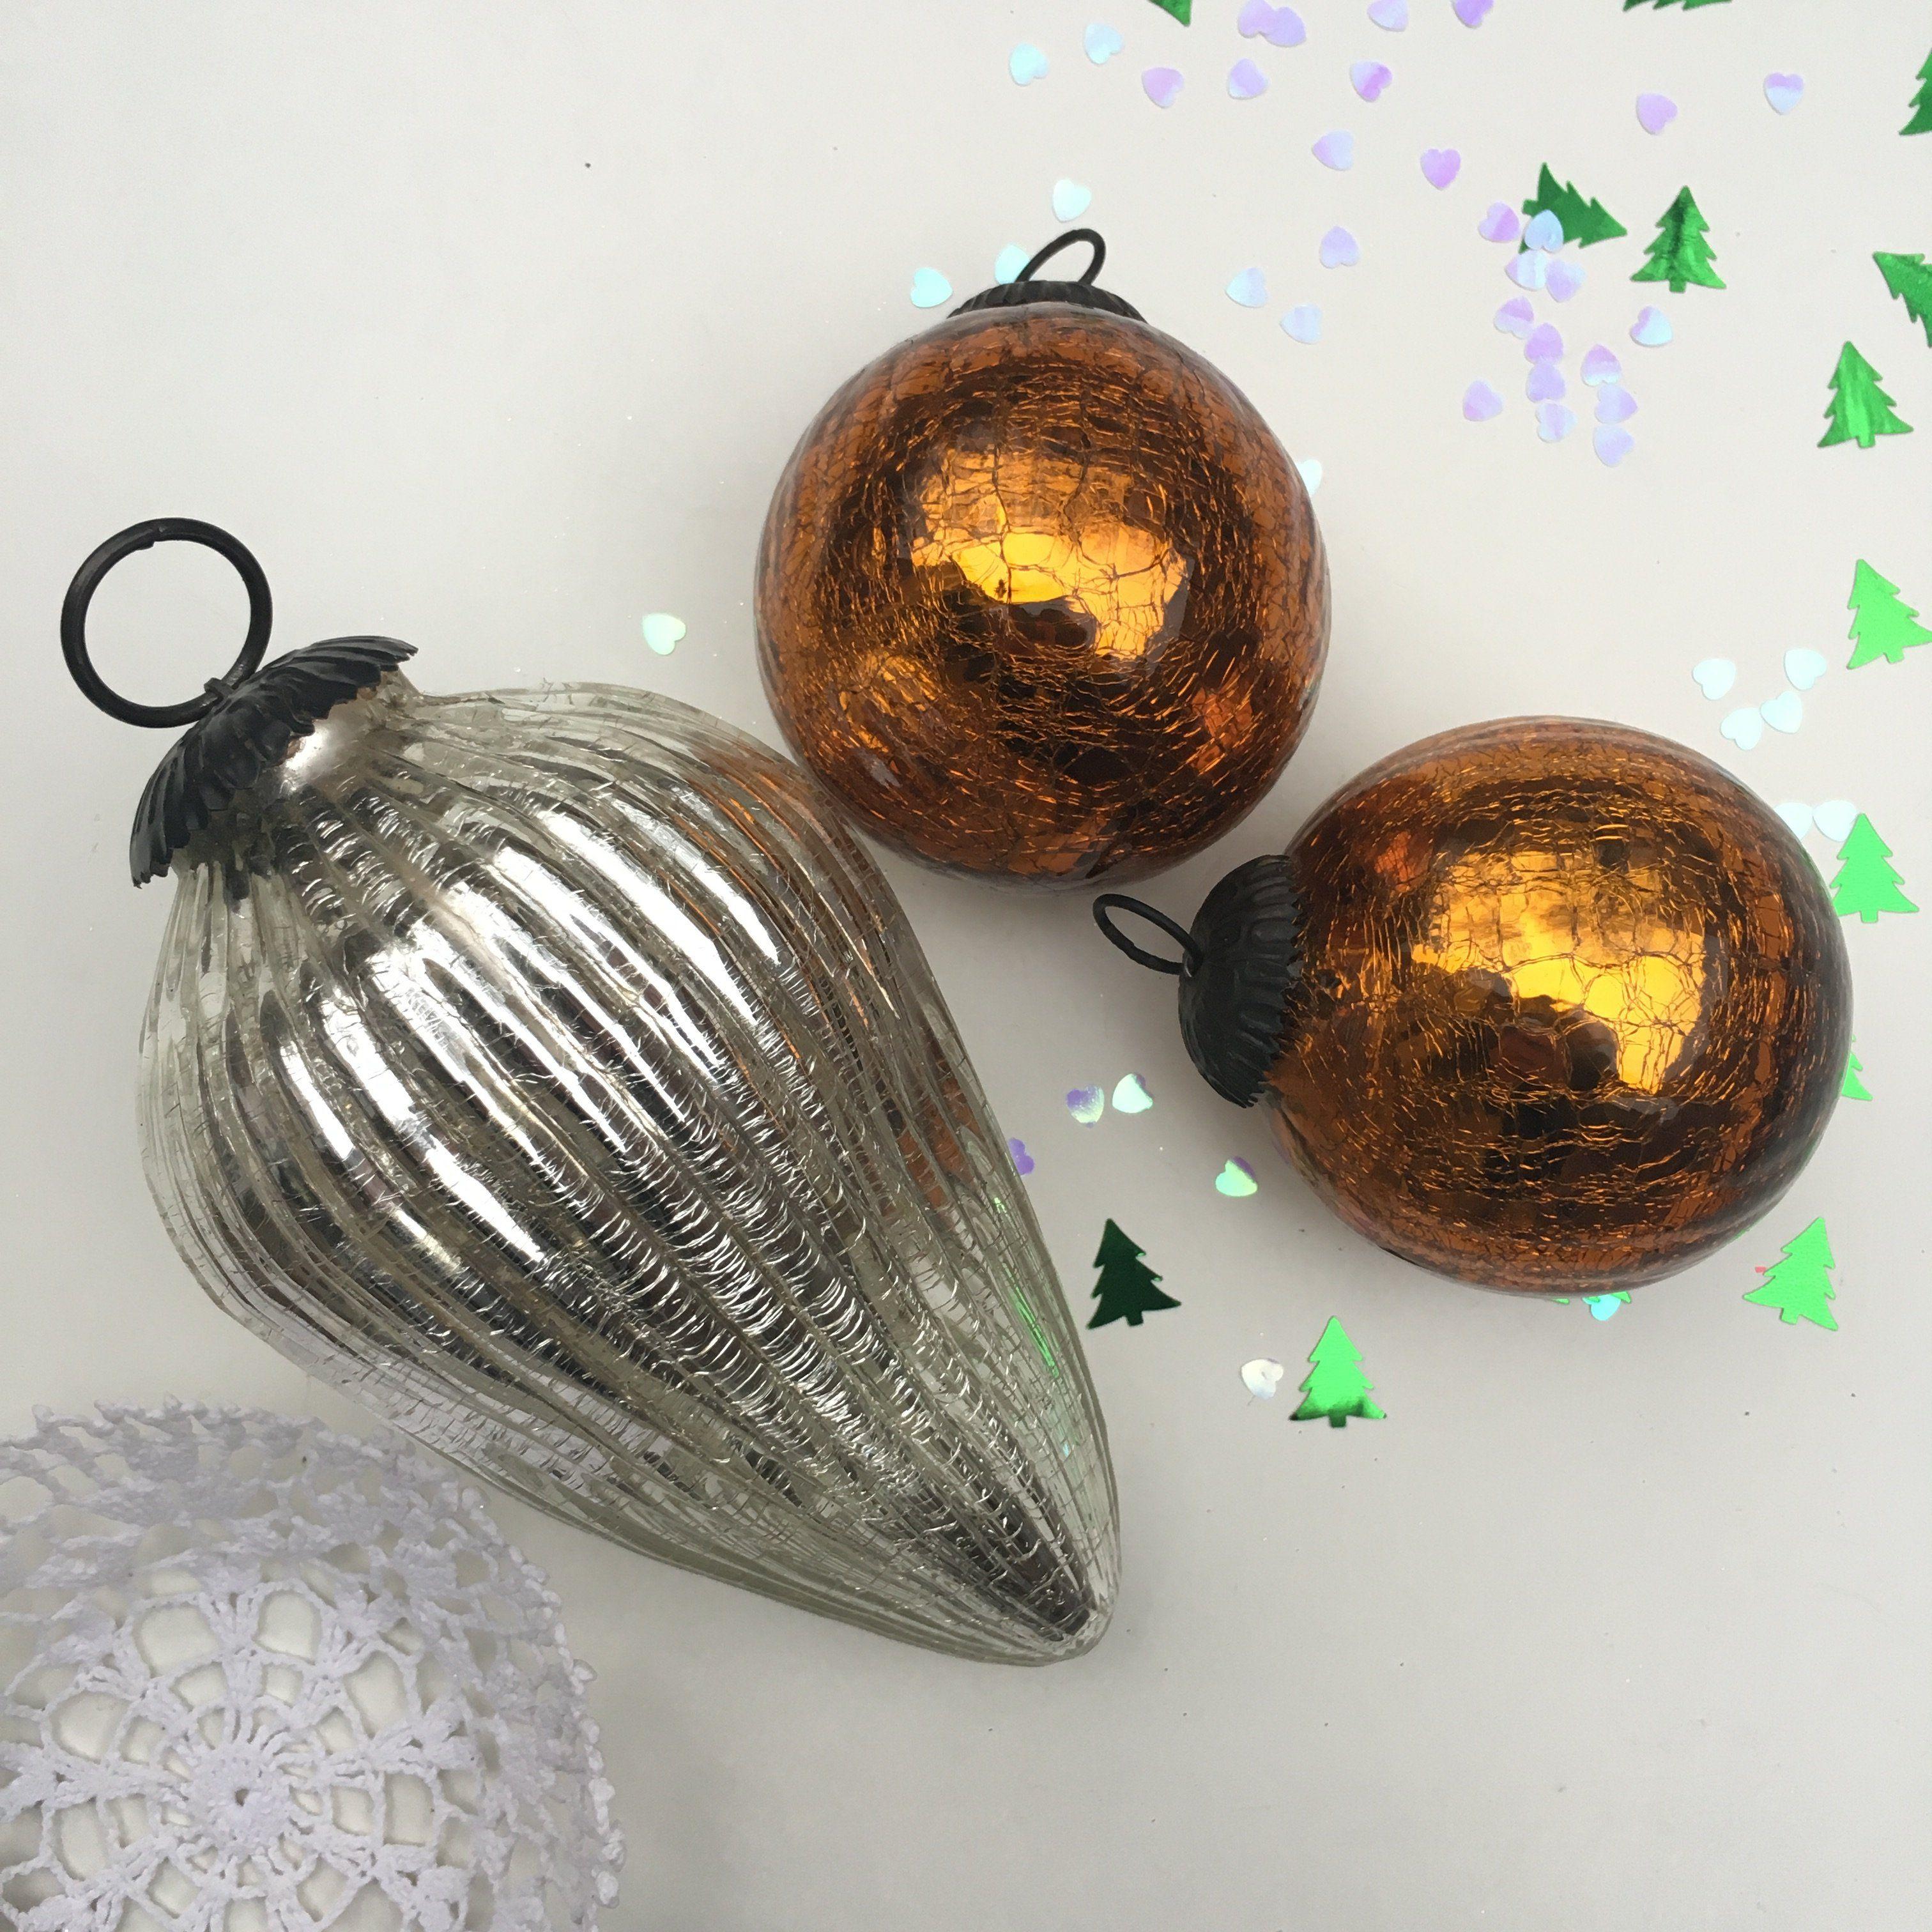 Boules De Noel Anciennes Orangevertevintage — Boules de Noel Anciennes Boules de Pardon